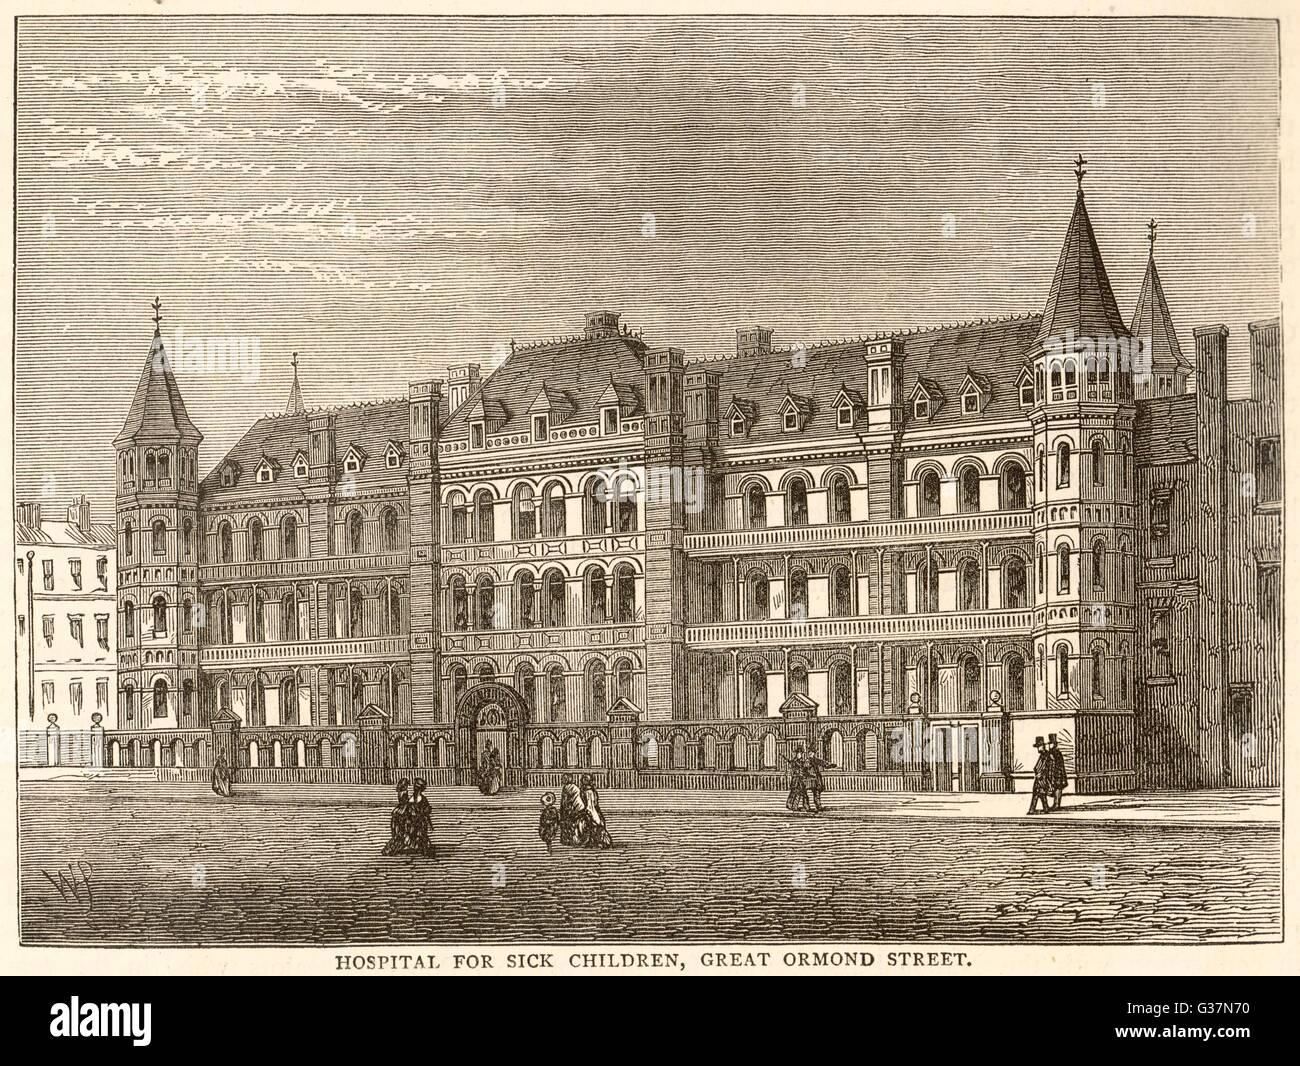 Krankenhaus für kranke Kinder, GT Ormond St.        Datum: um 1880 Stockbild